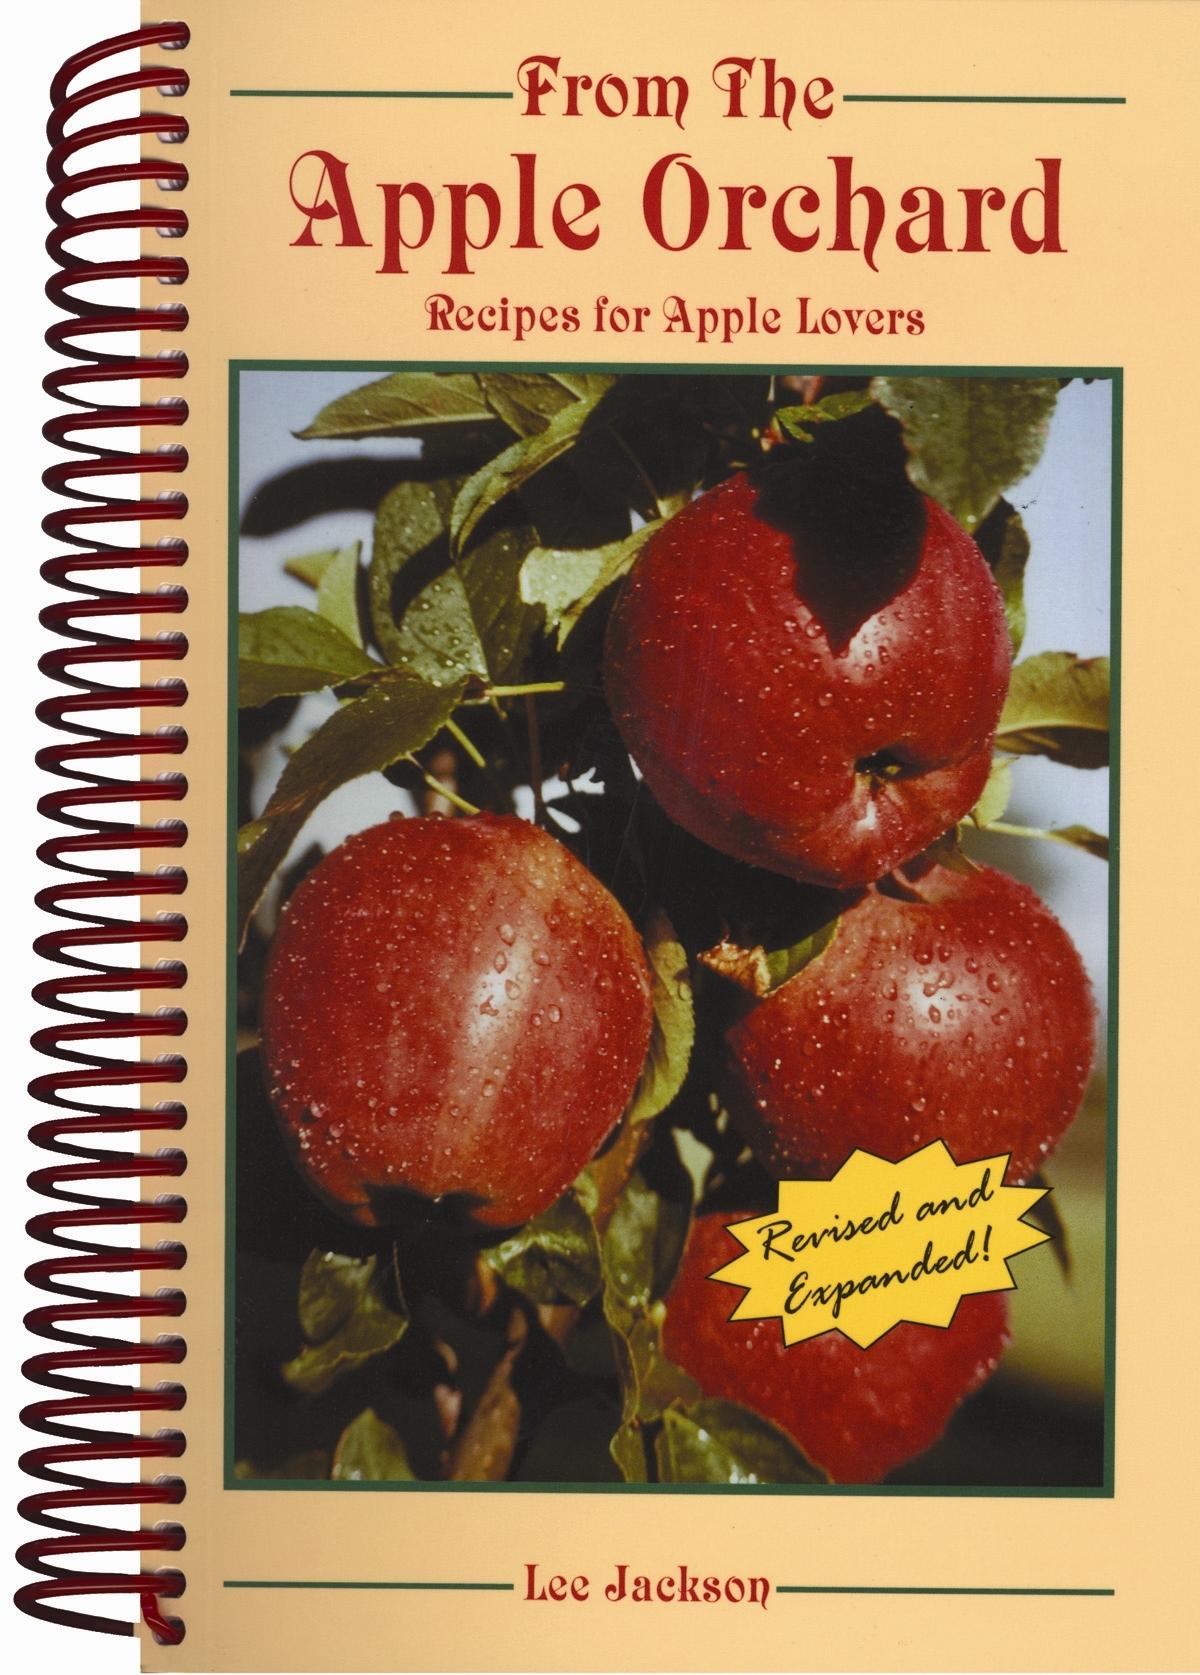 9780930643225 Apple Expert Shares Favorite Recipe